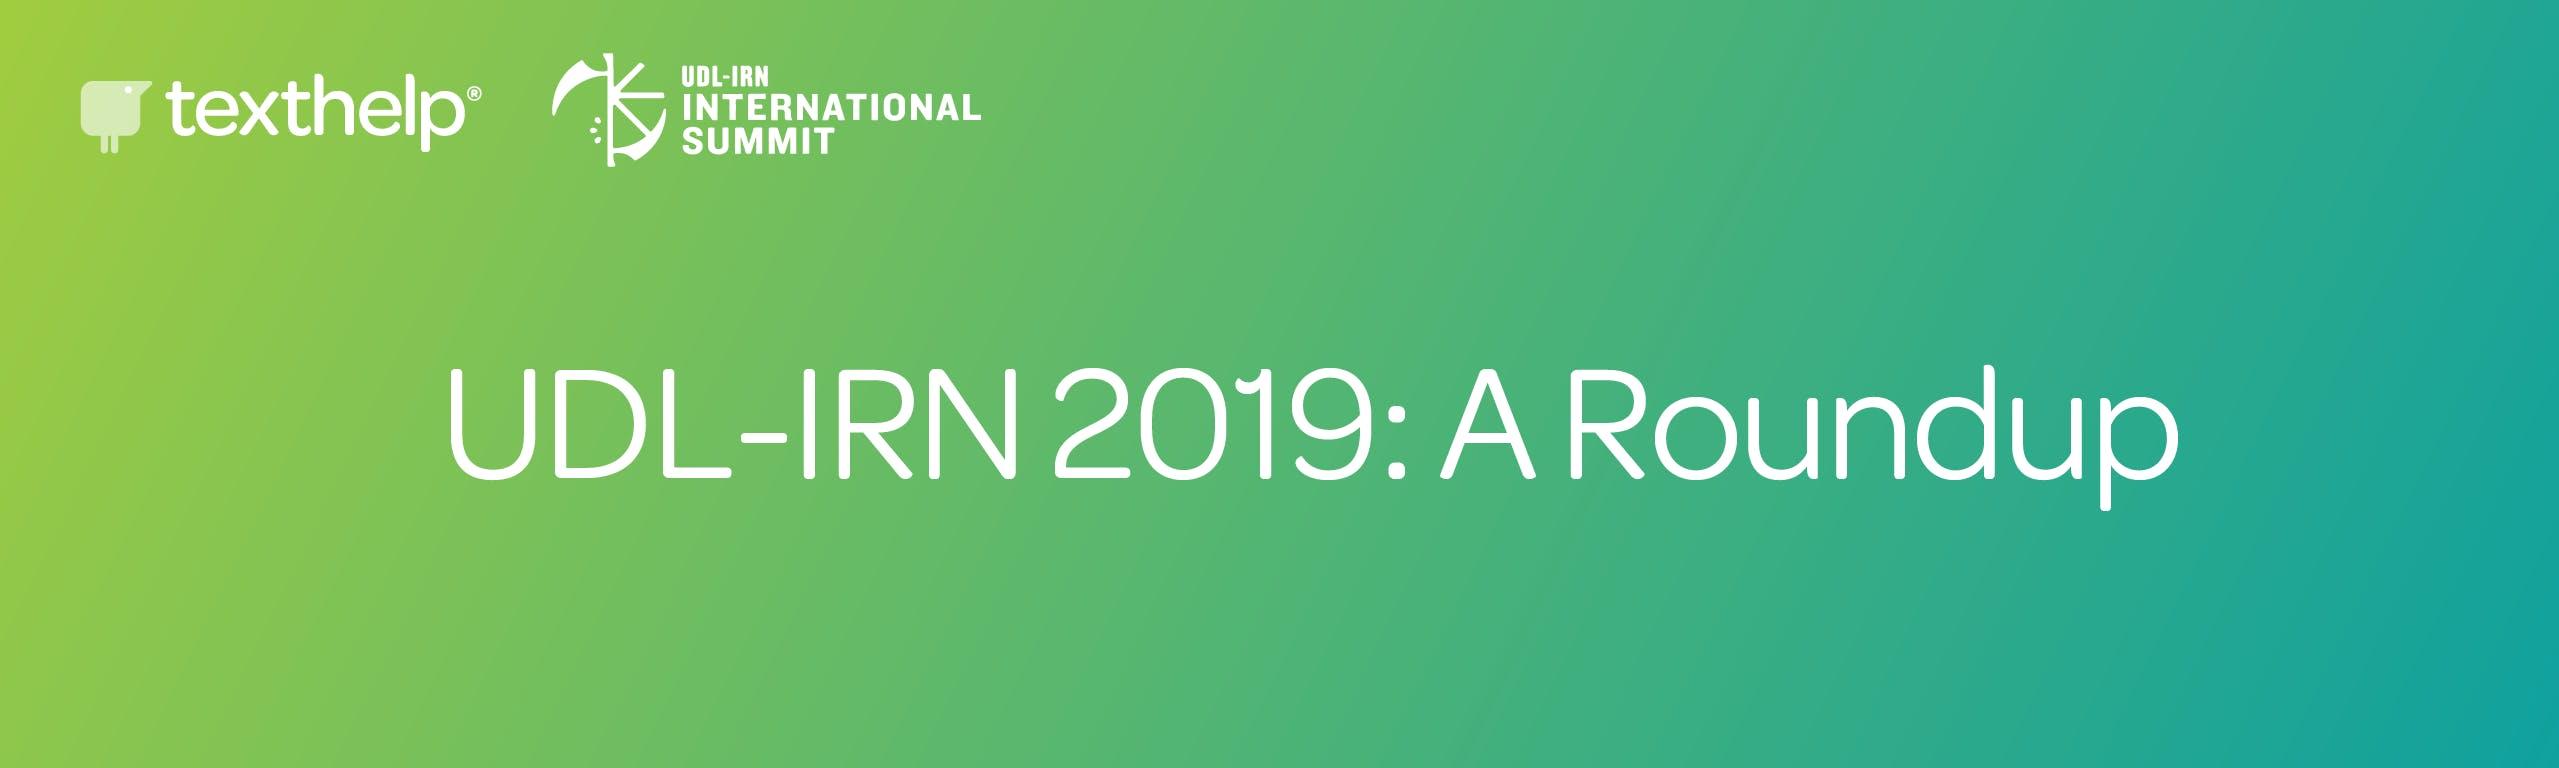 URL-IRN 2019: A roundup